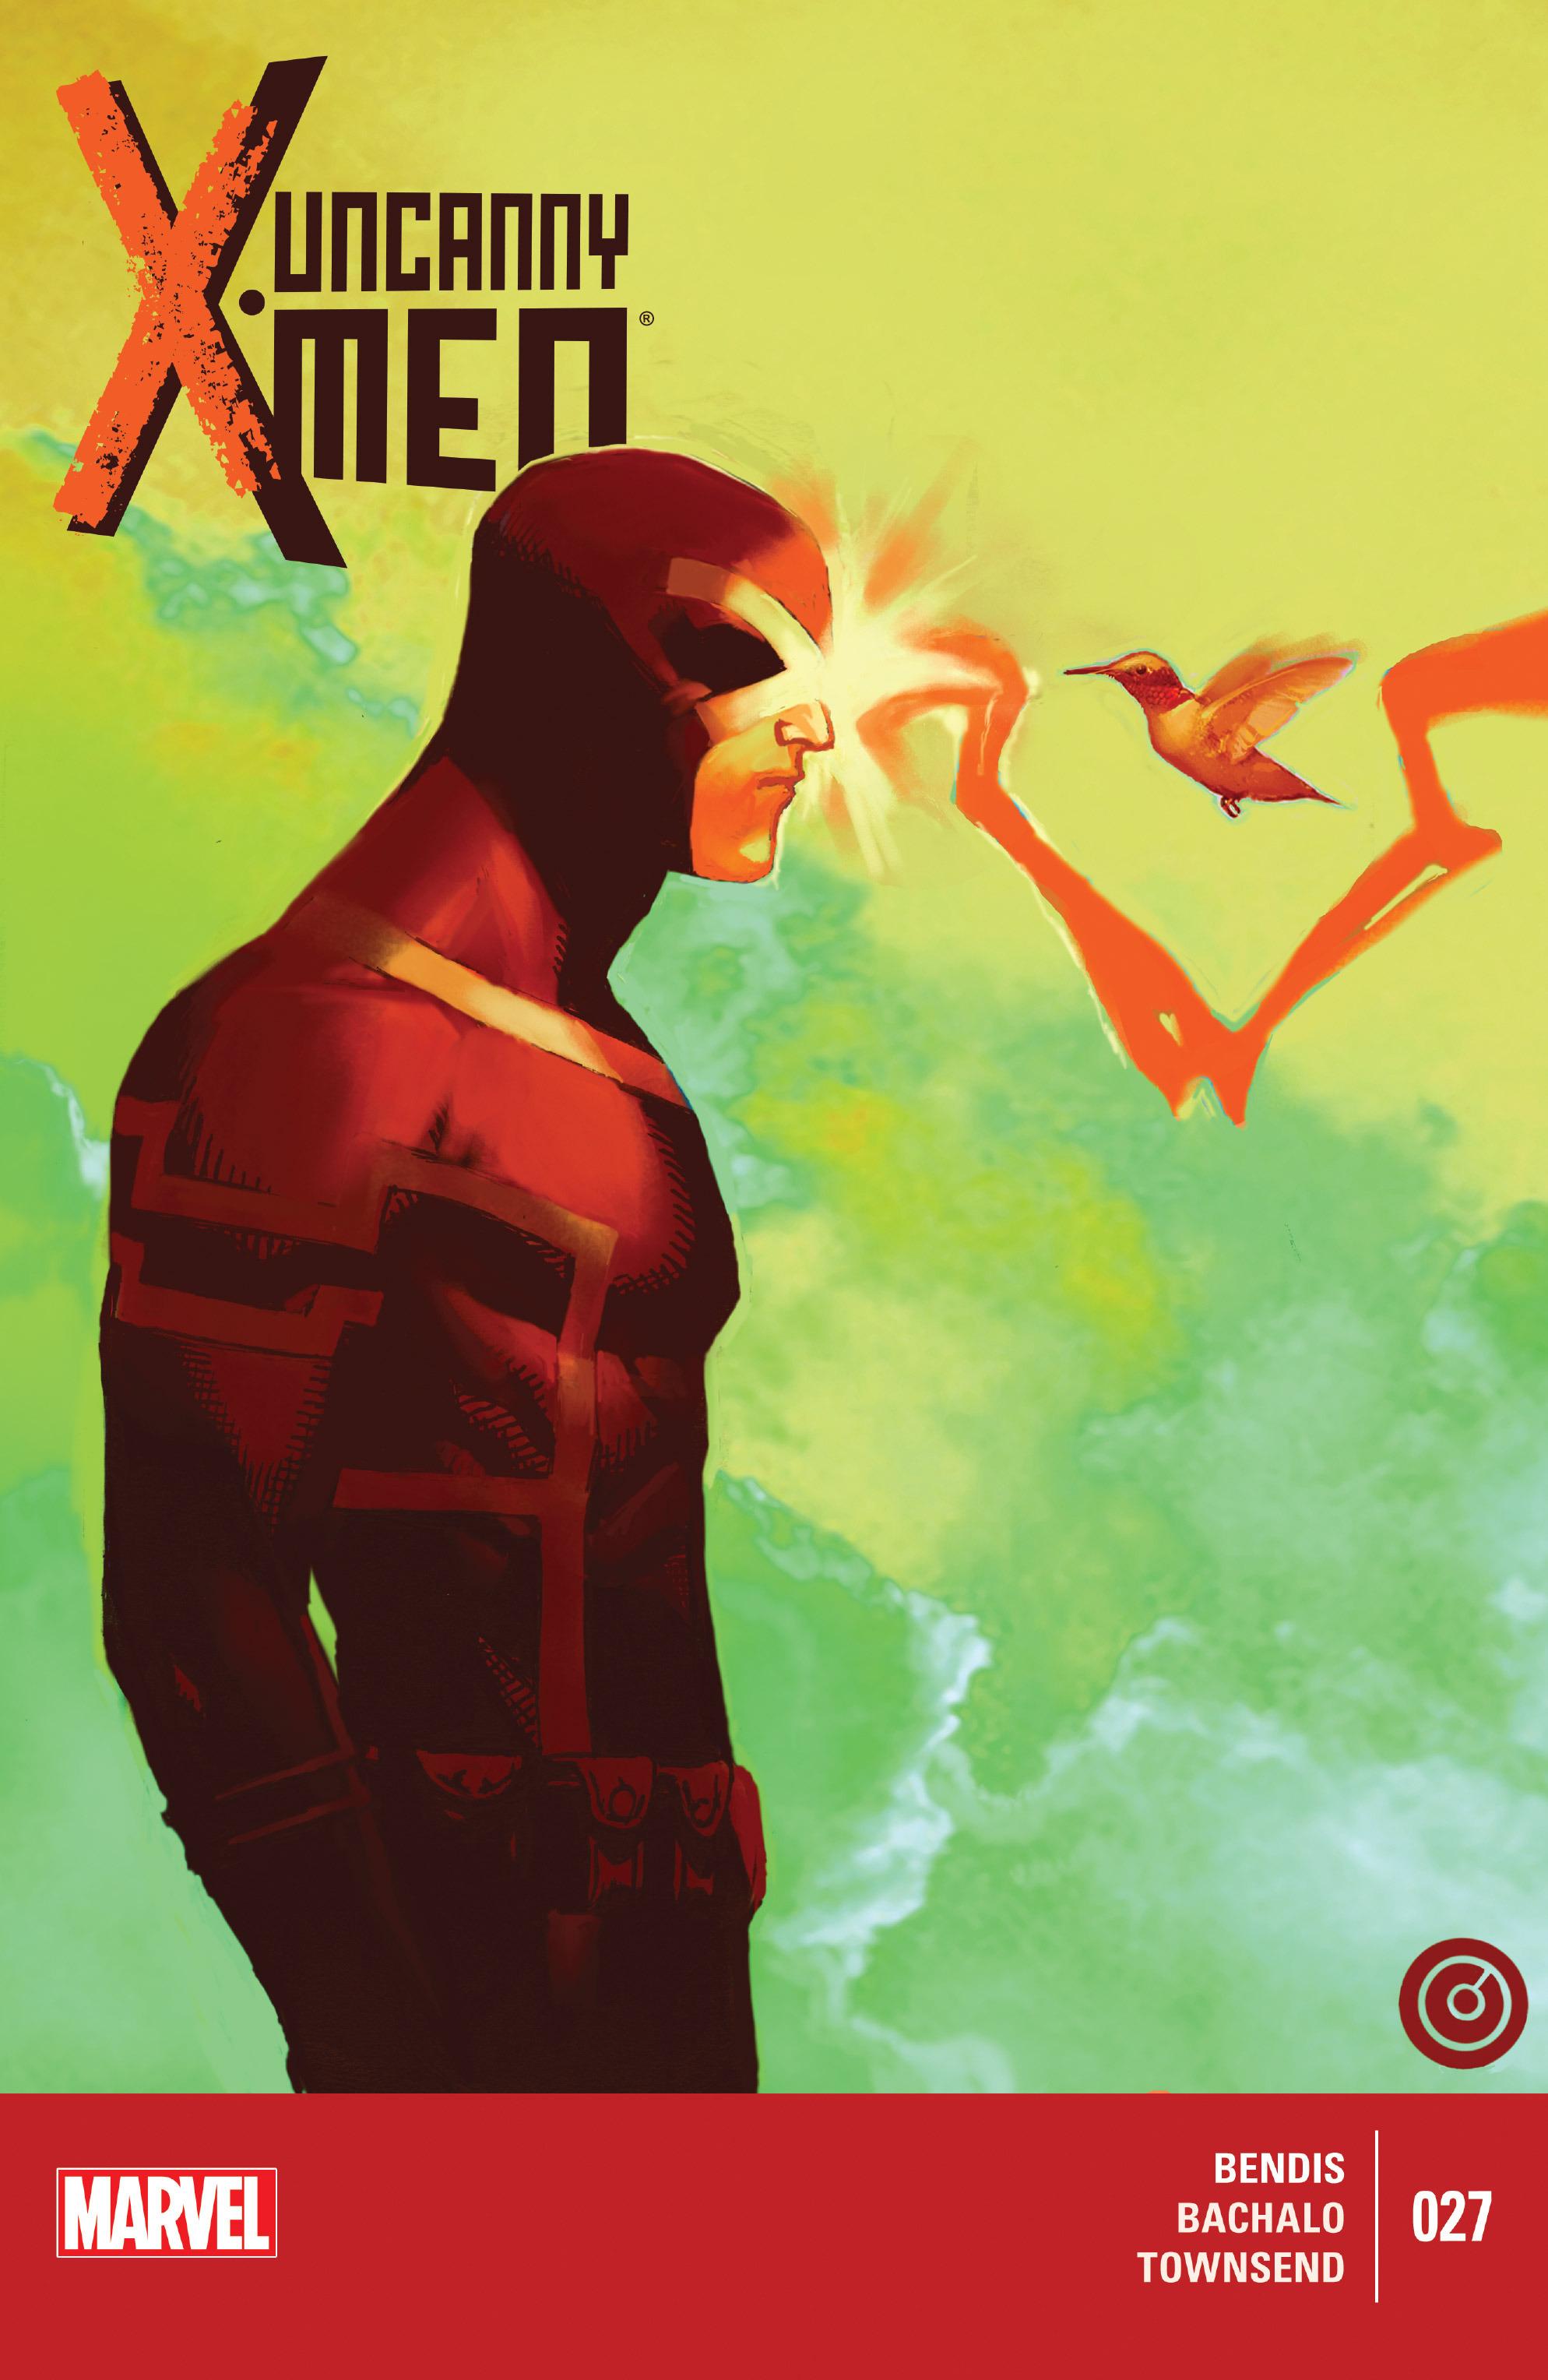 Read online Uncanny X-Men (2013) comic -  Issue # _TPB 5 - The Omega Mutant - 20